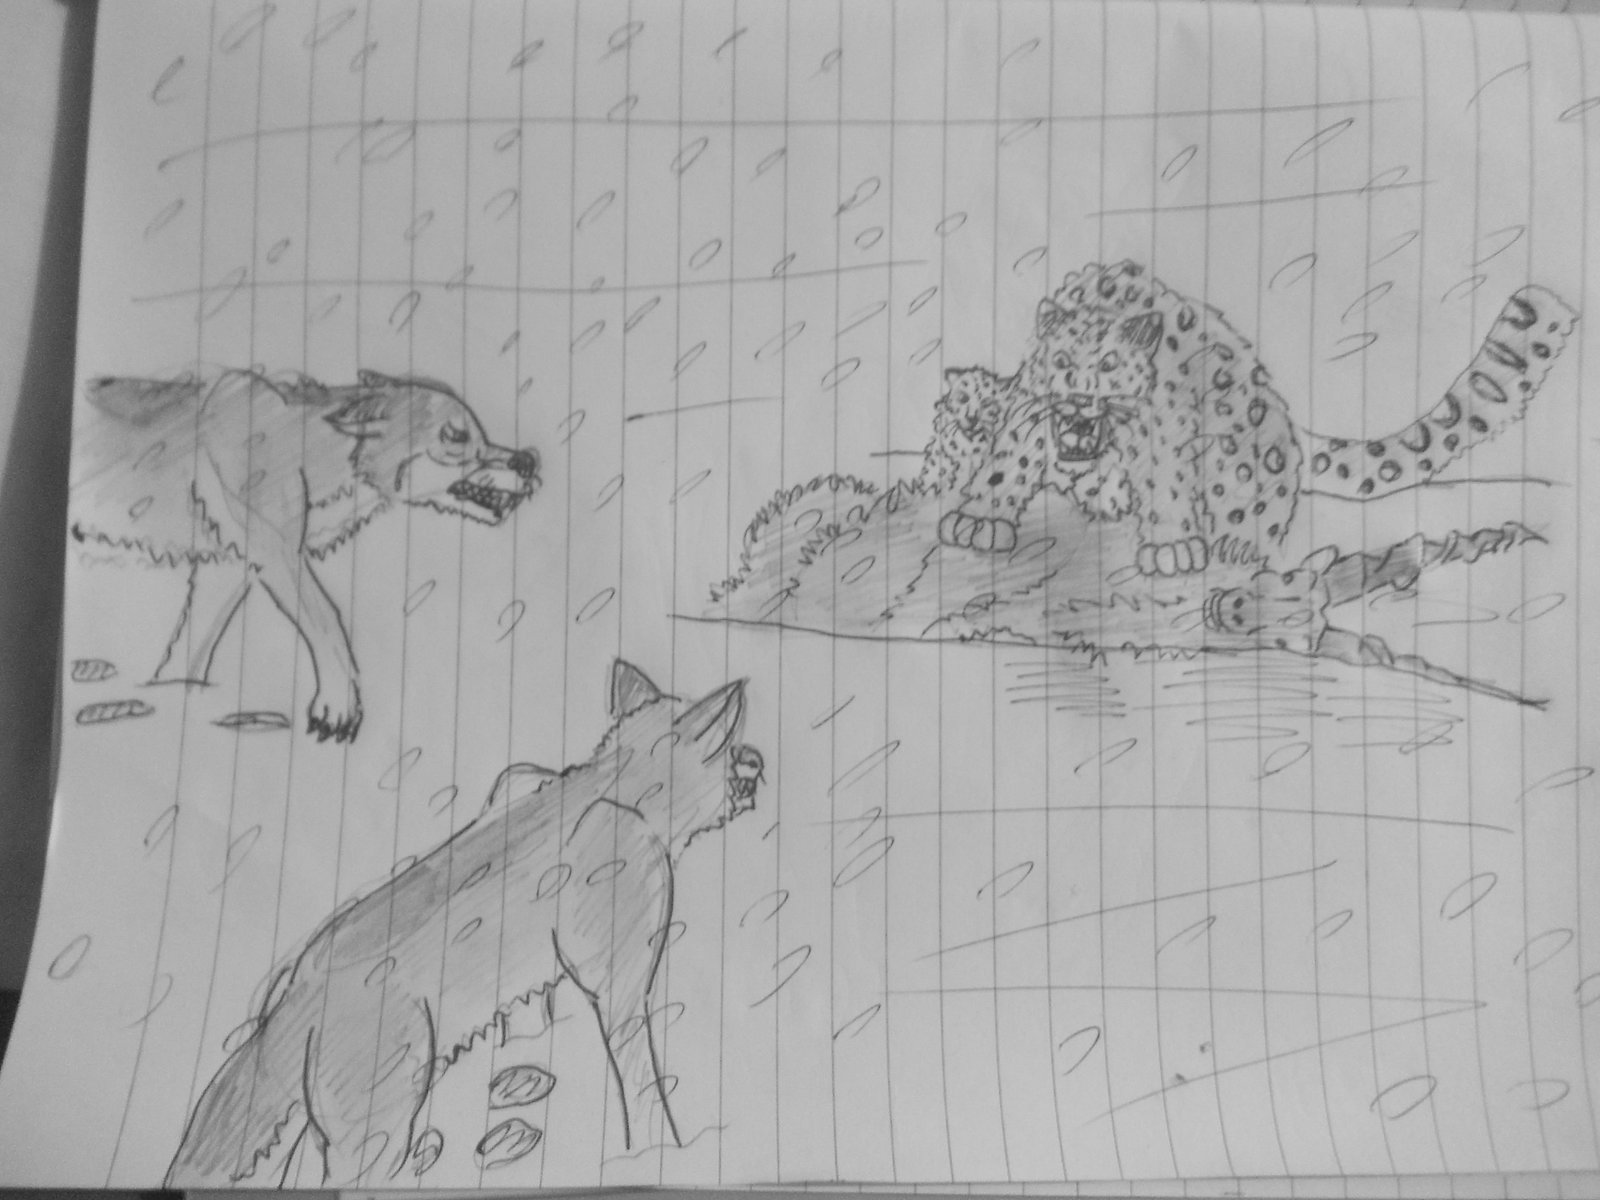 Drawn snow leopard wolf WDGHK DeviantArt vs Leopard Wolves